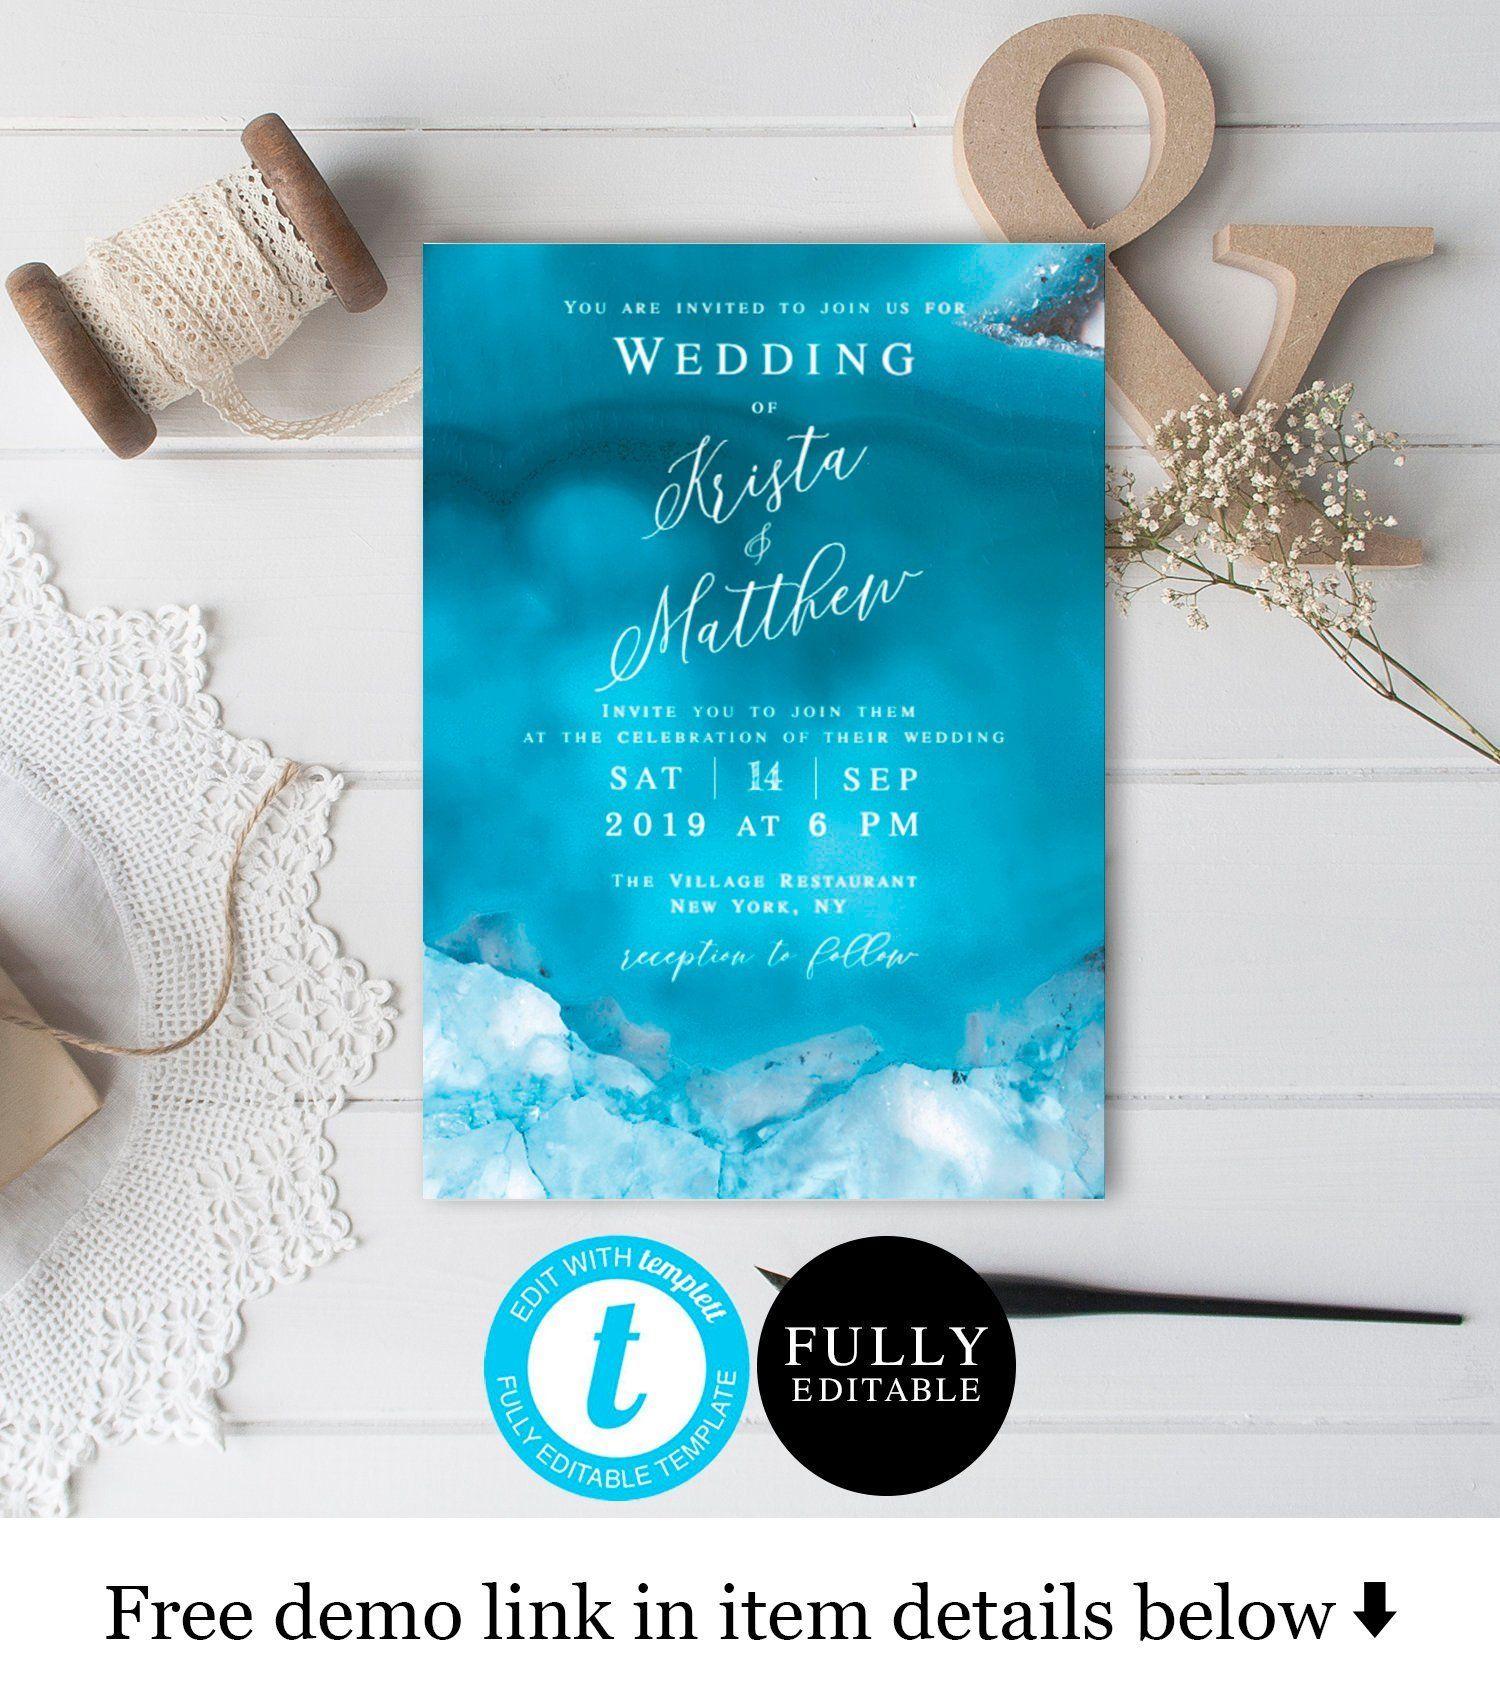 Blue Wedding Invitation Template Fully Editable Templett Instant